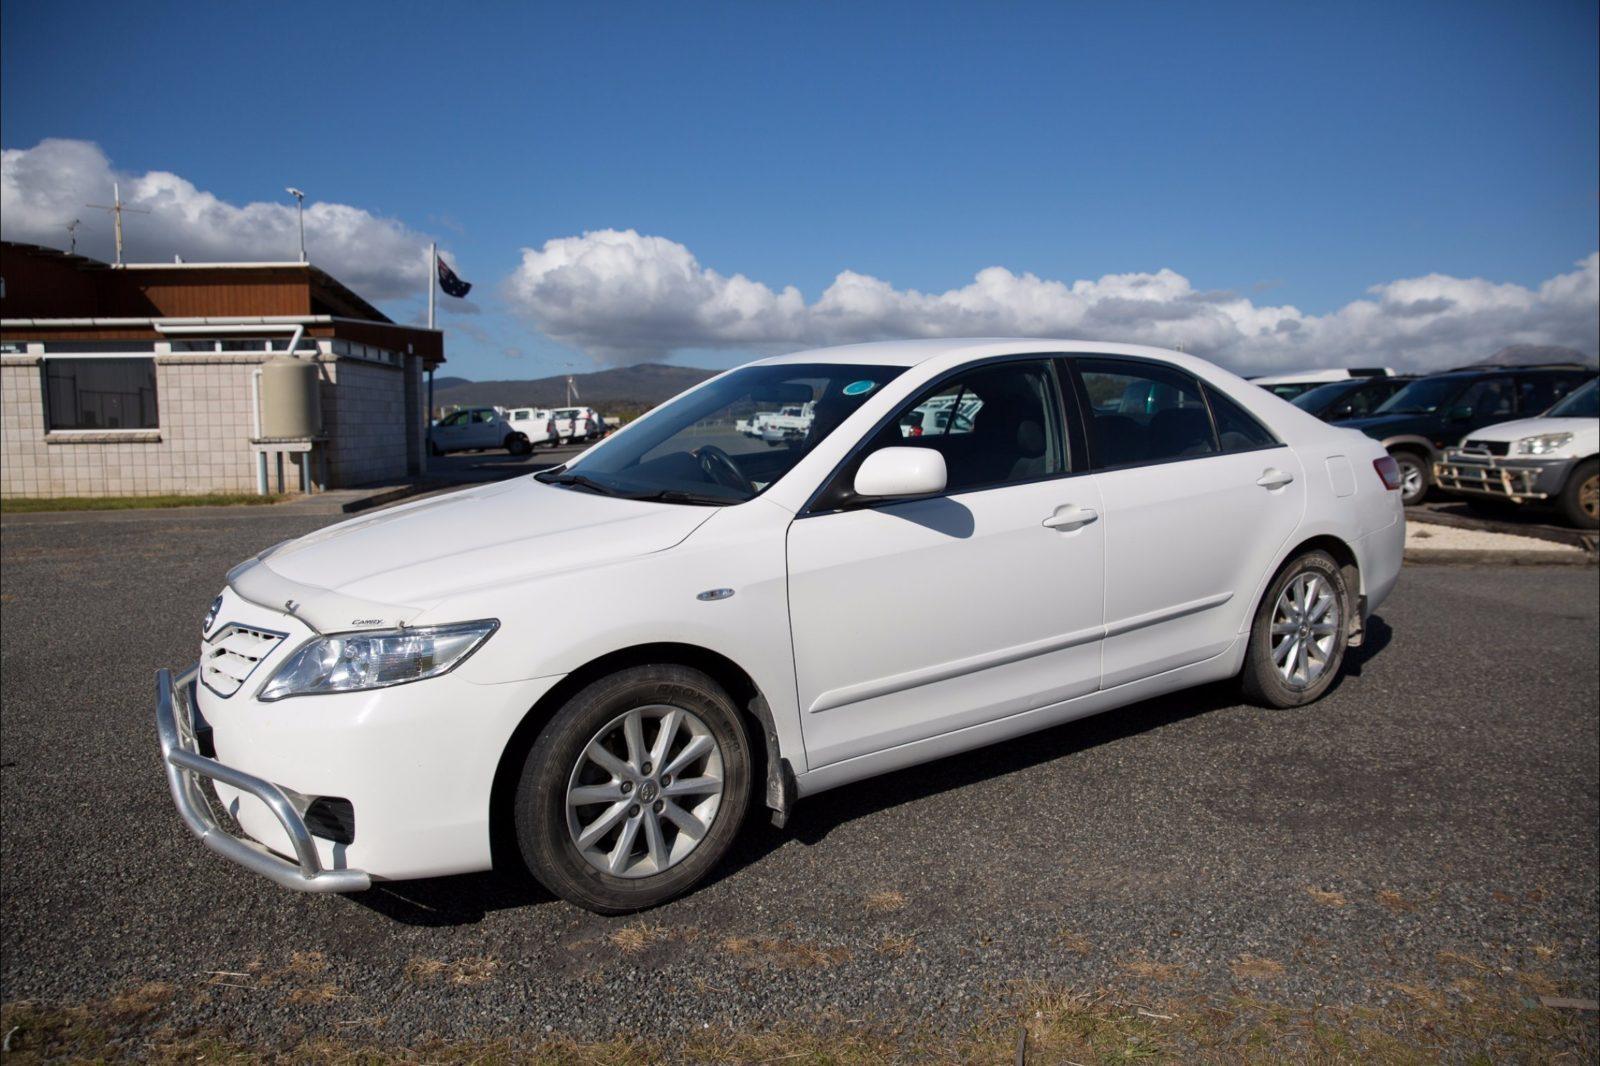 Flinders Island Car Rentals Toyota Camry sedan auto